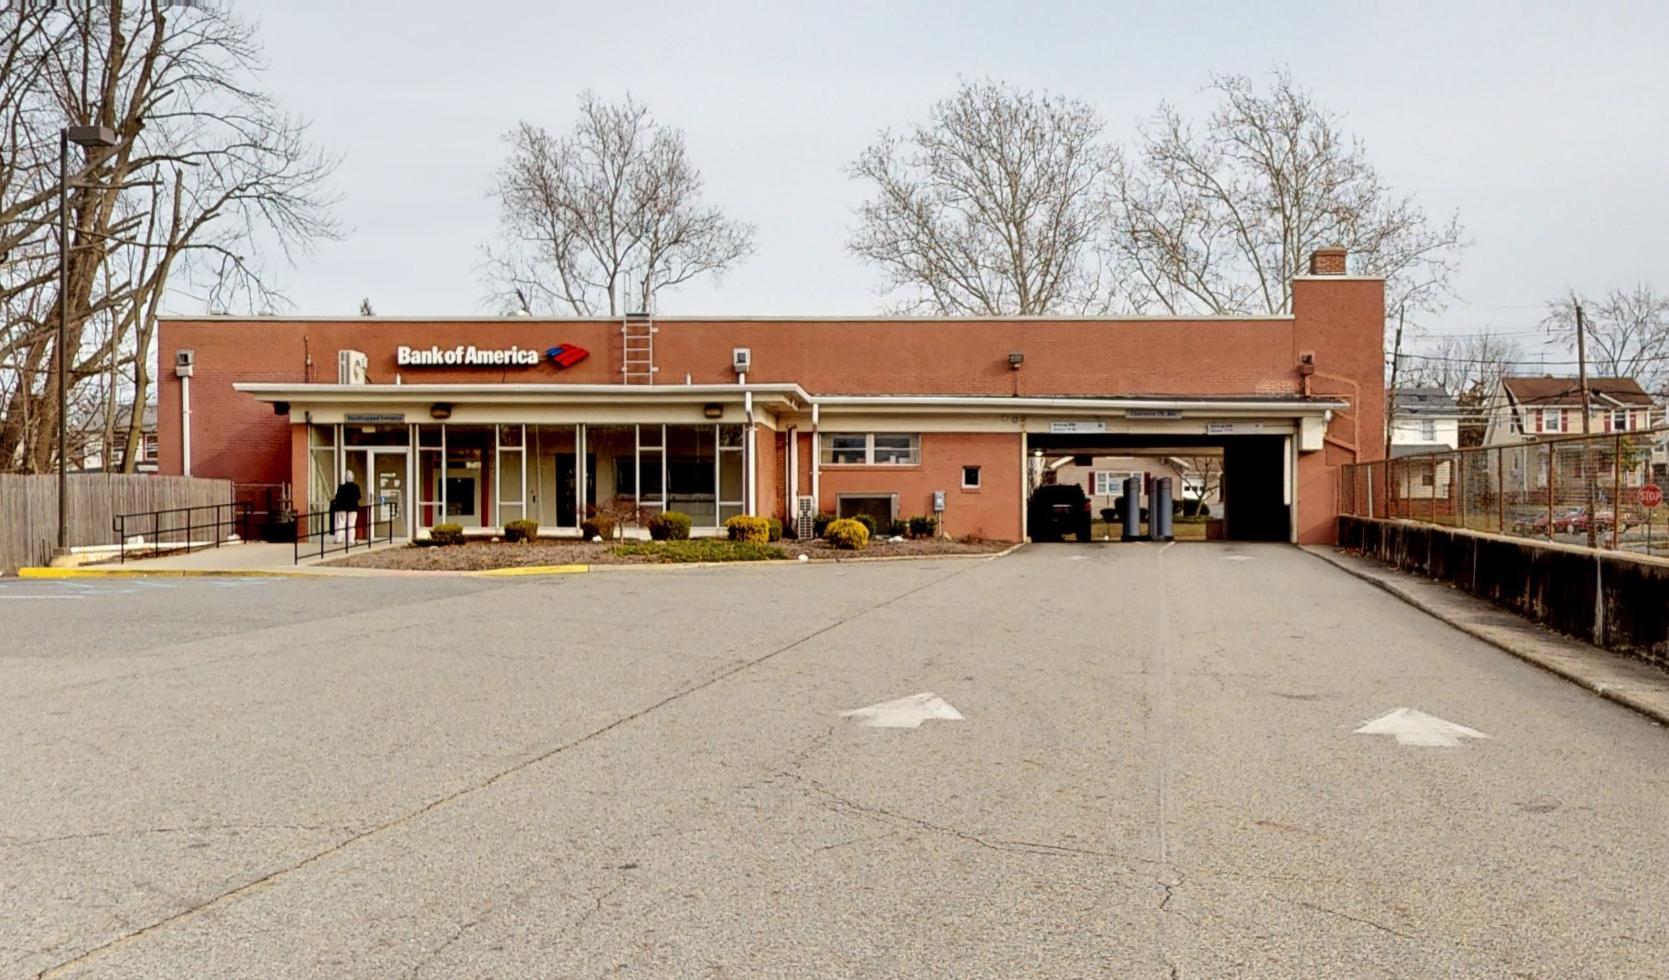 Bank of America financial center with drive-thru ATM   609 Livingston Ave, New Brunswick, NJ 08901